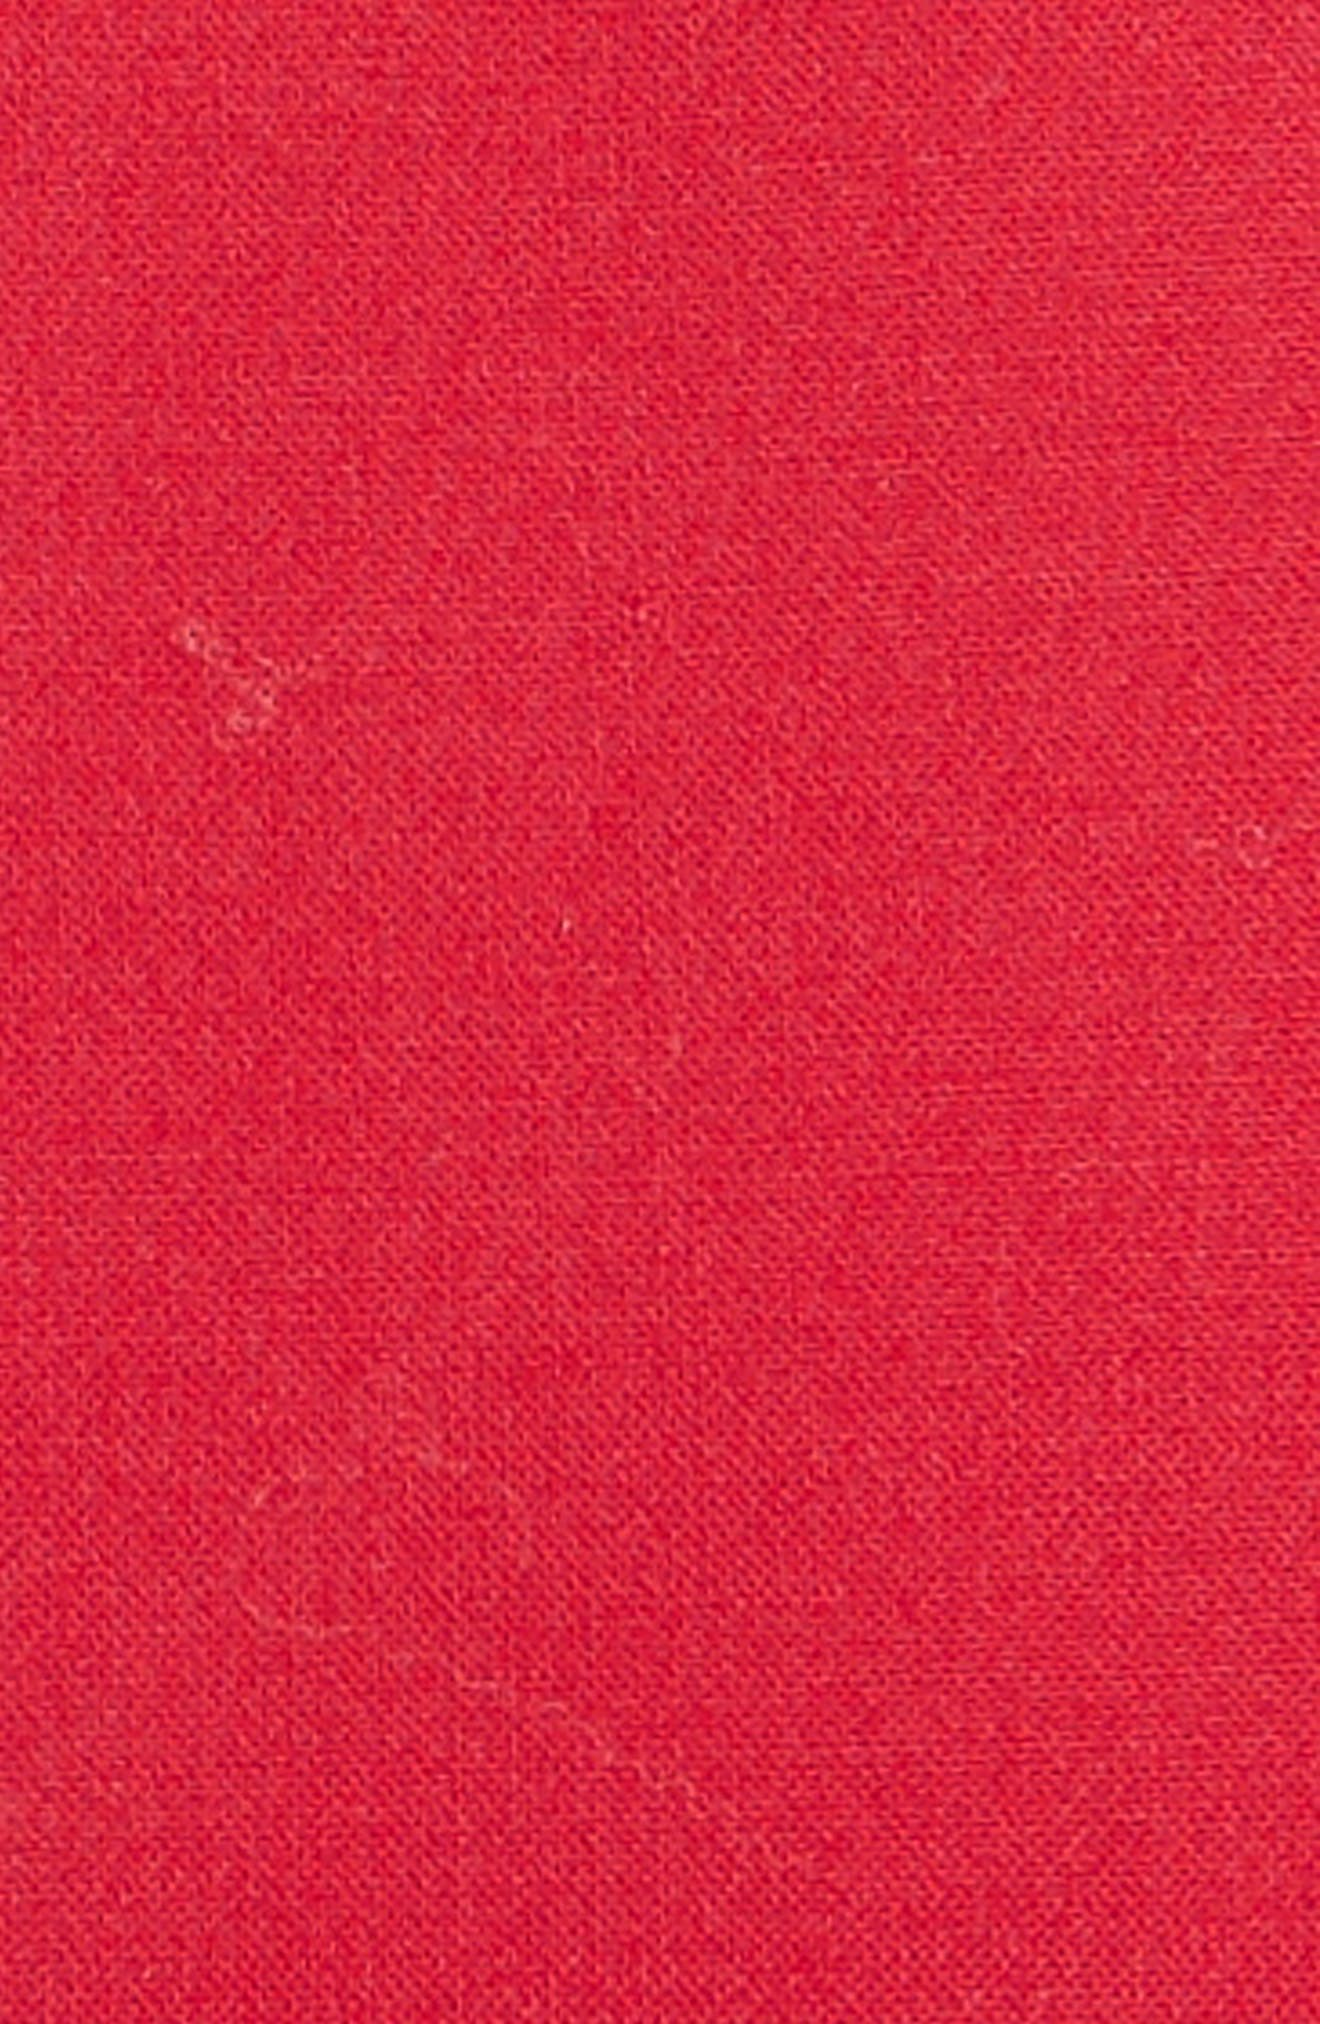 Stretch Crepe Sheath Dress,                             Alternate thumbnail 3, color,                             Garnet